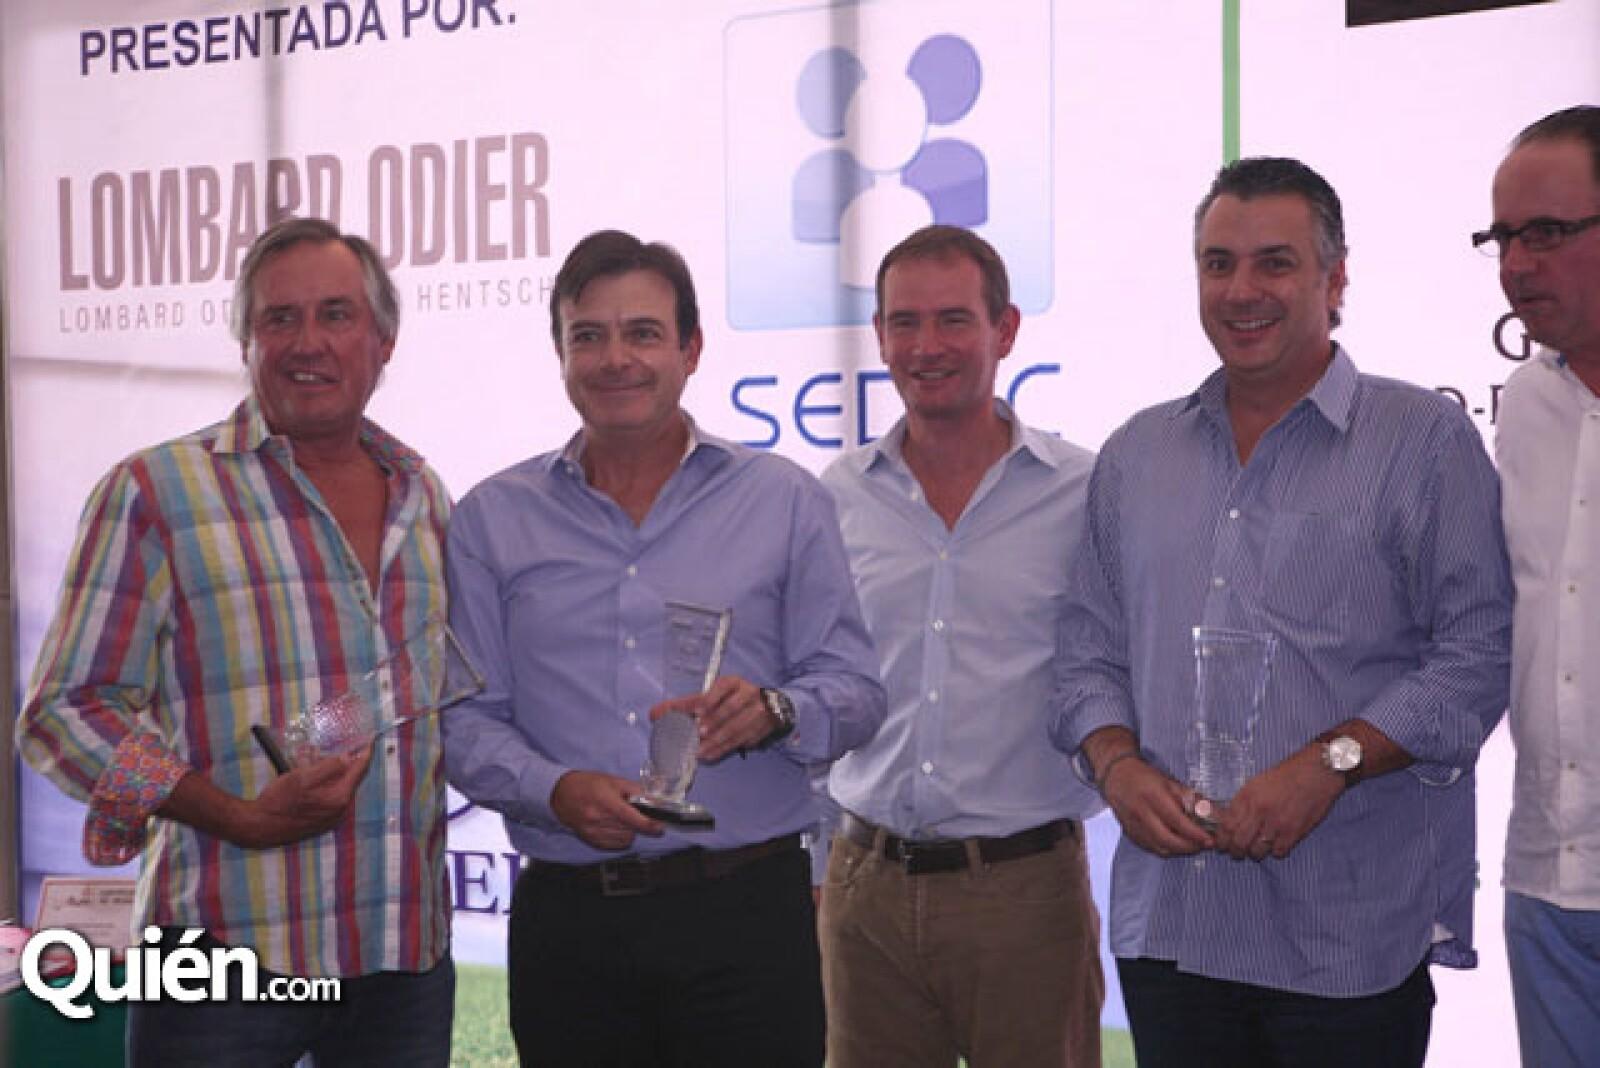 Edmundo Igartua,Oscar Barragán,Pedro Boullosa,Miguel Ferré